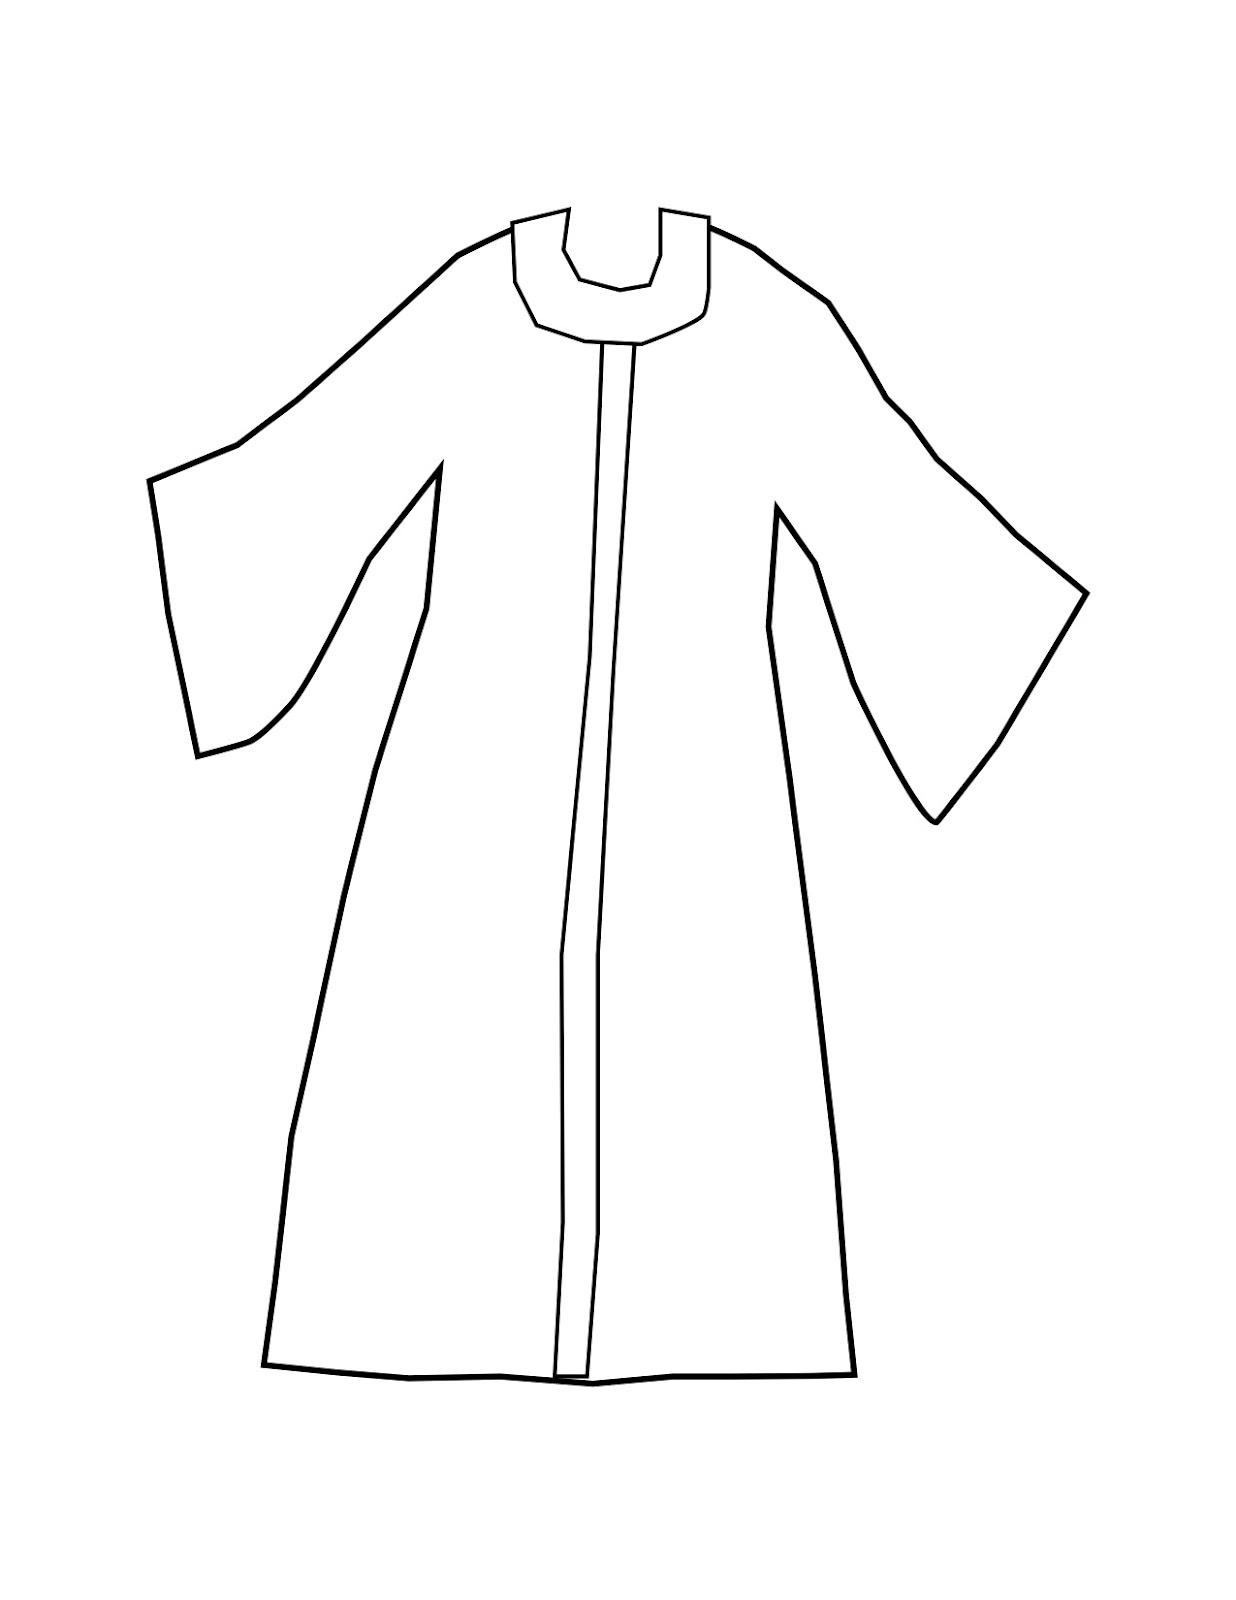 coloring pages joseph coat - photo#17